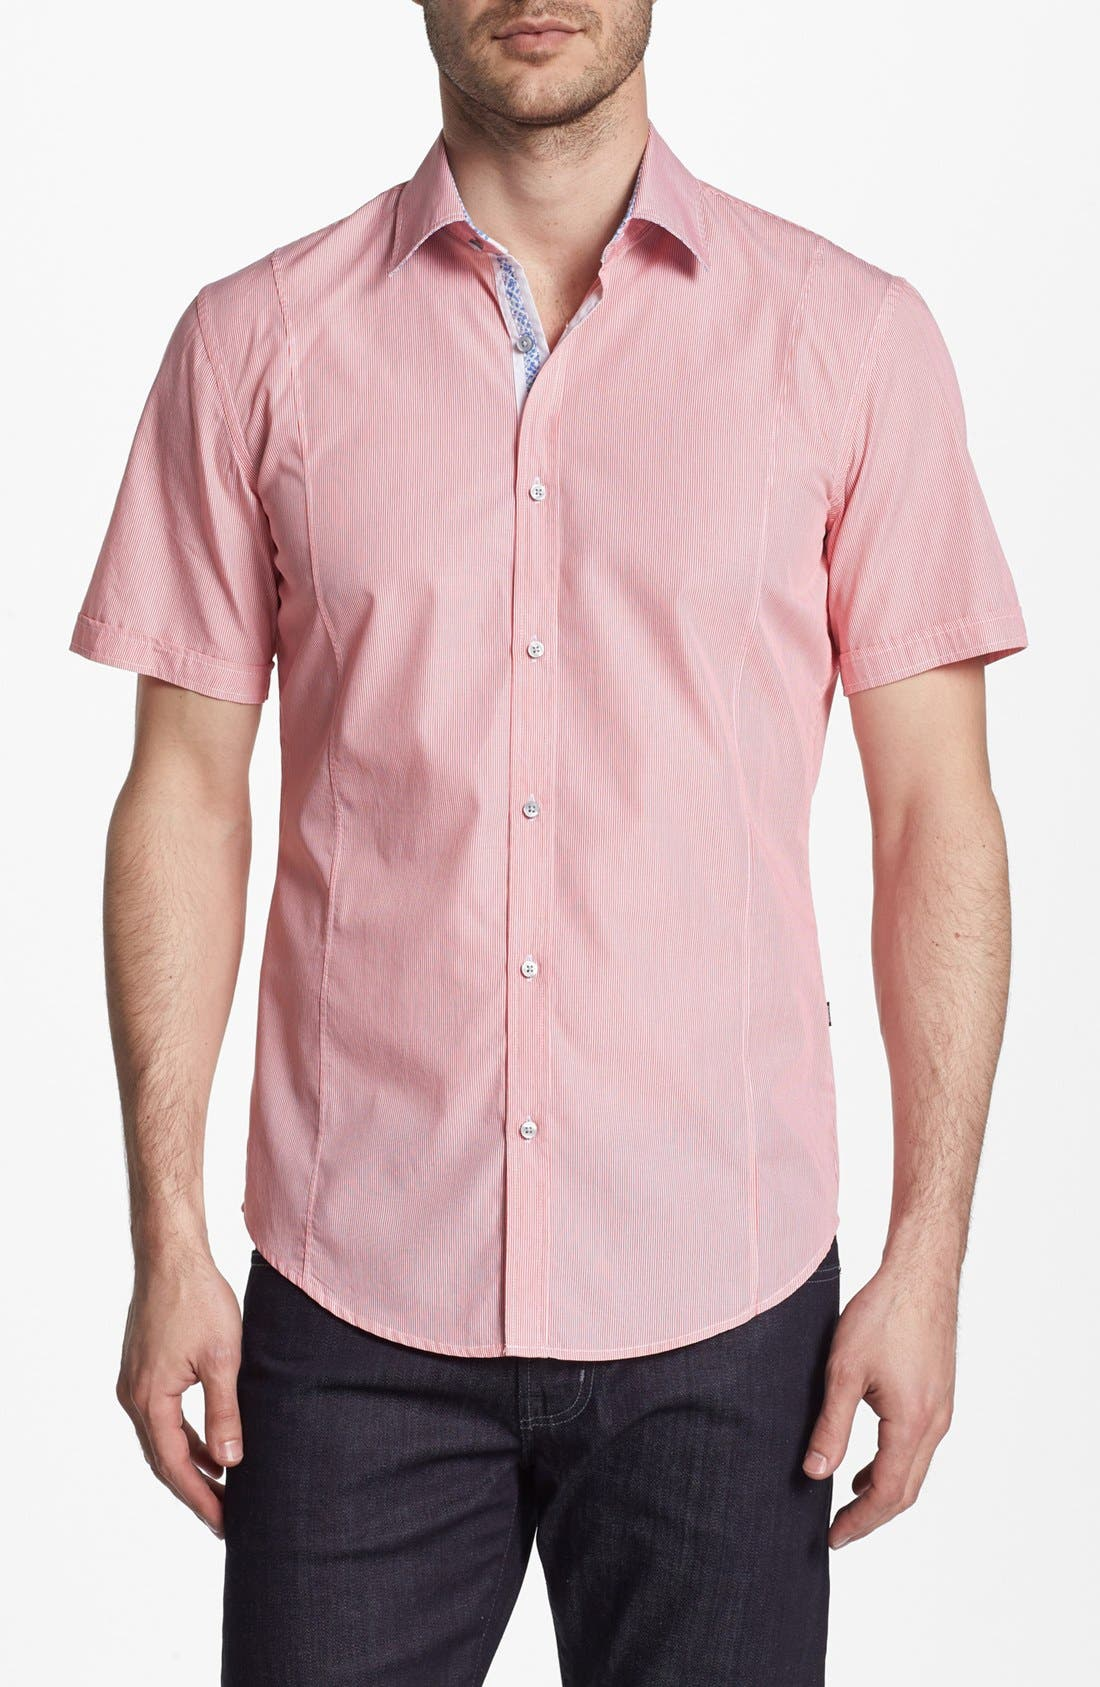 Main Image - BOSS HUGO BOSS 'Marco' Slim Fit Short Sleeve Sport Shirt